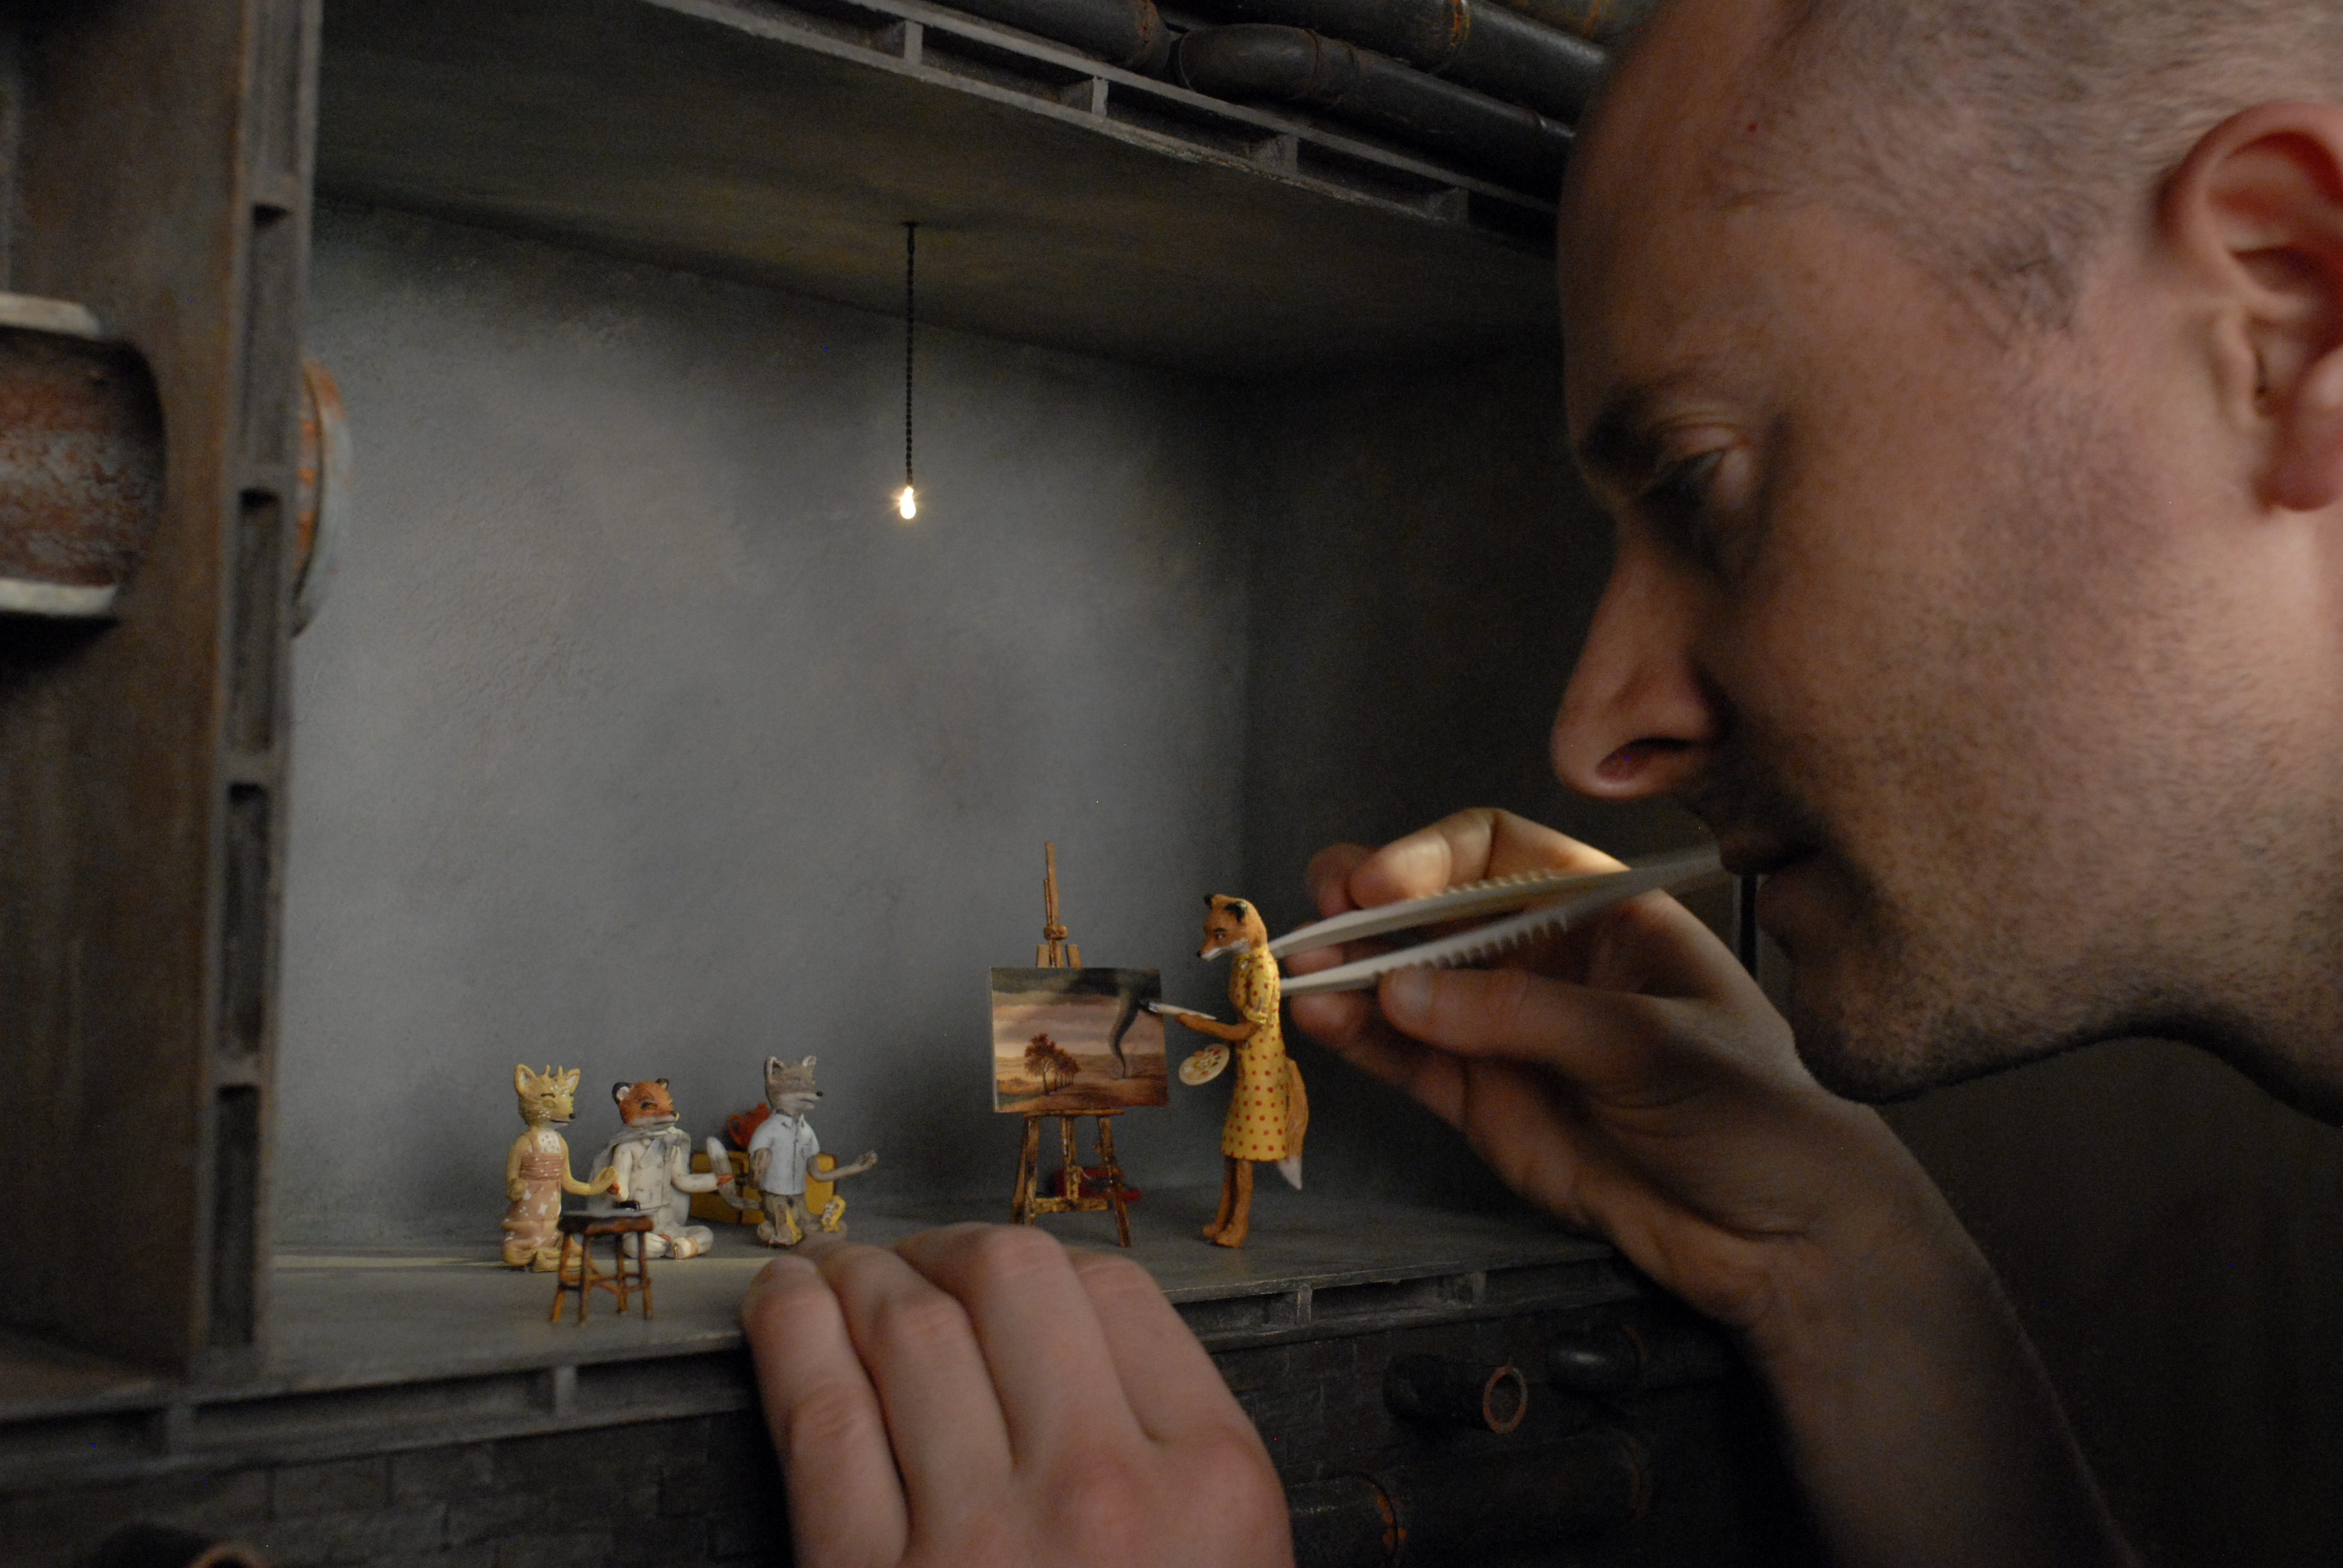 Fox miniture puppets